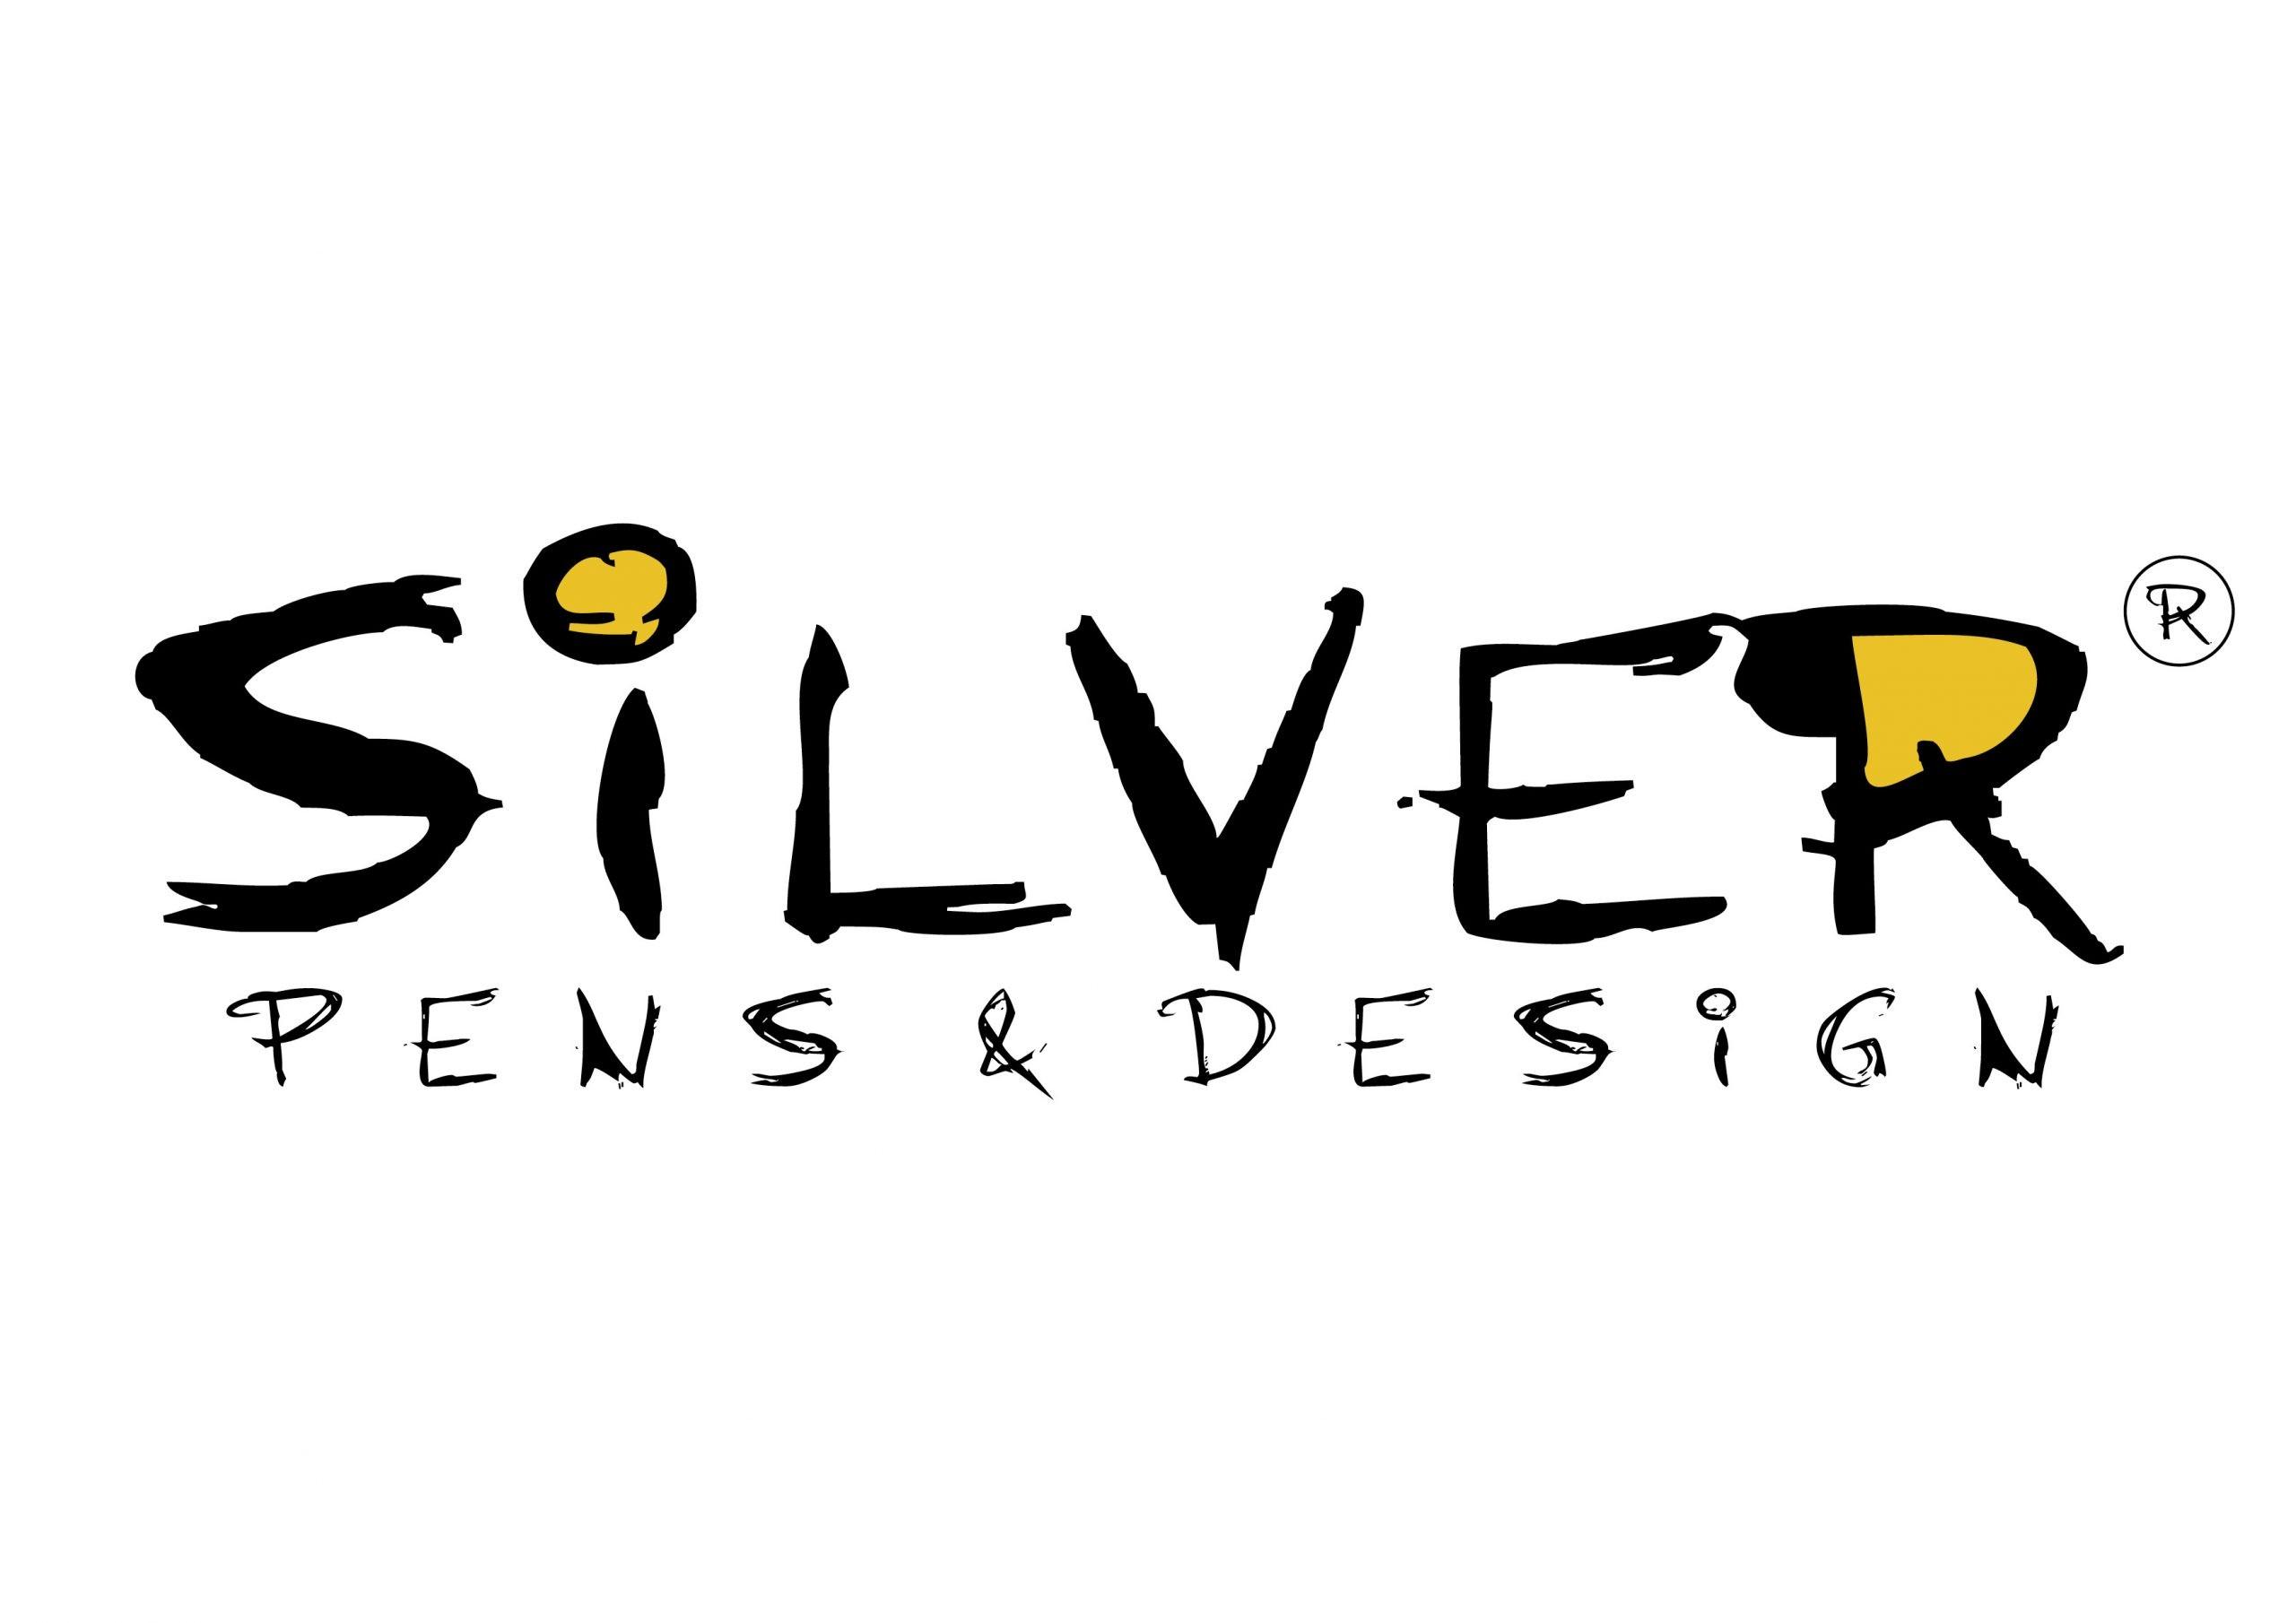 Silver-hi